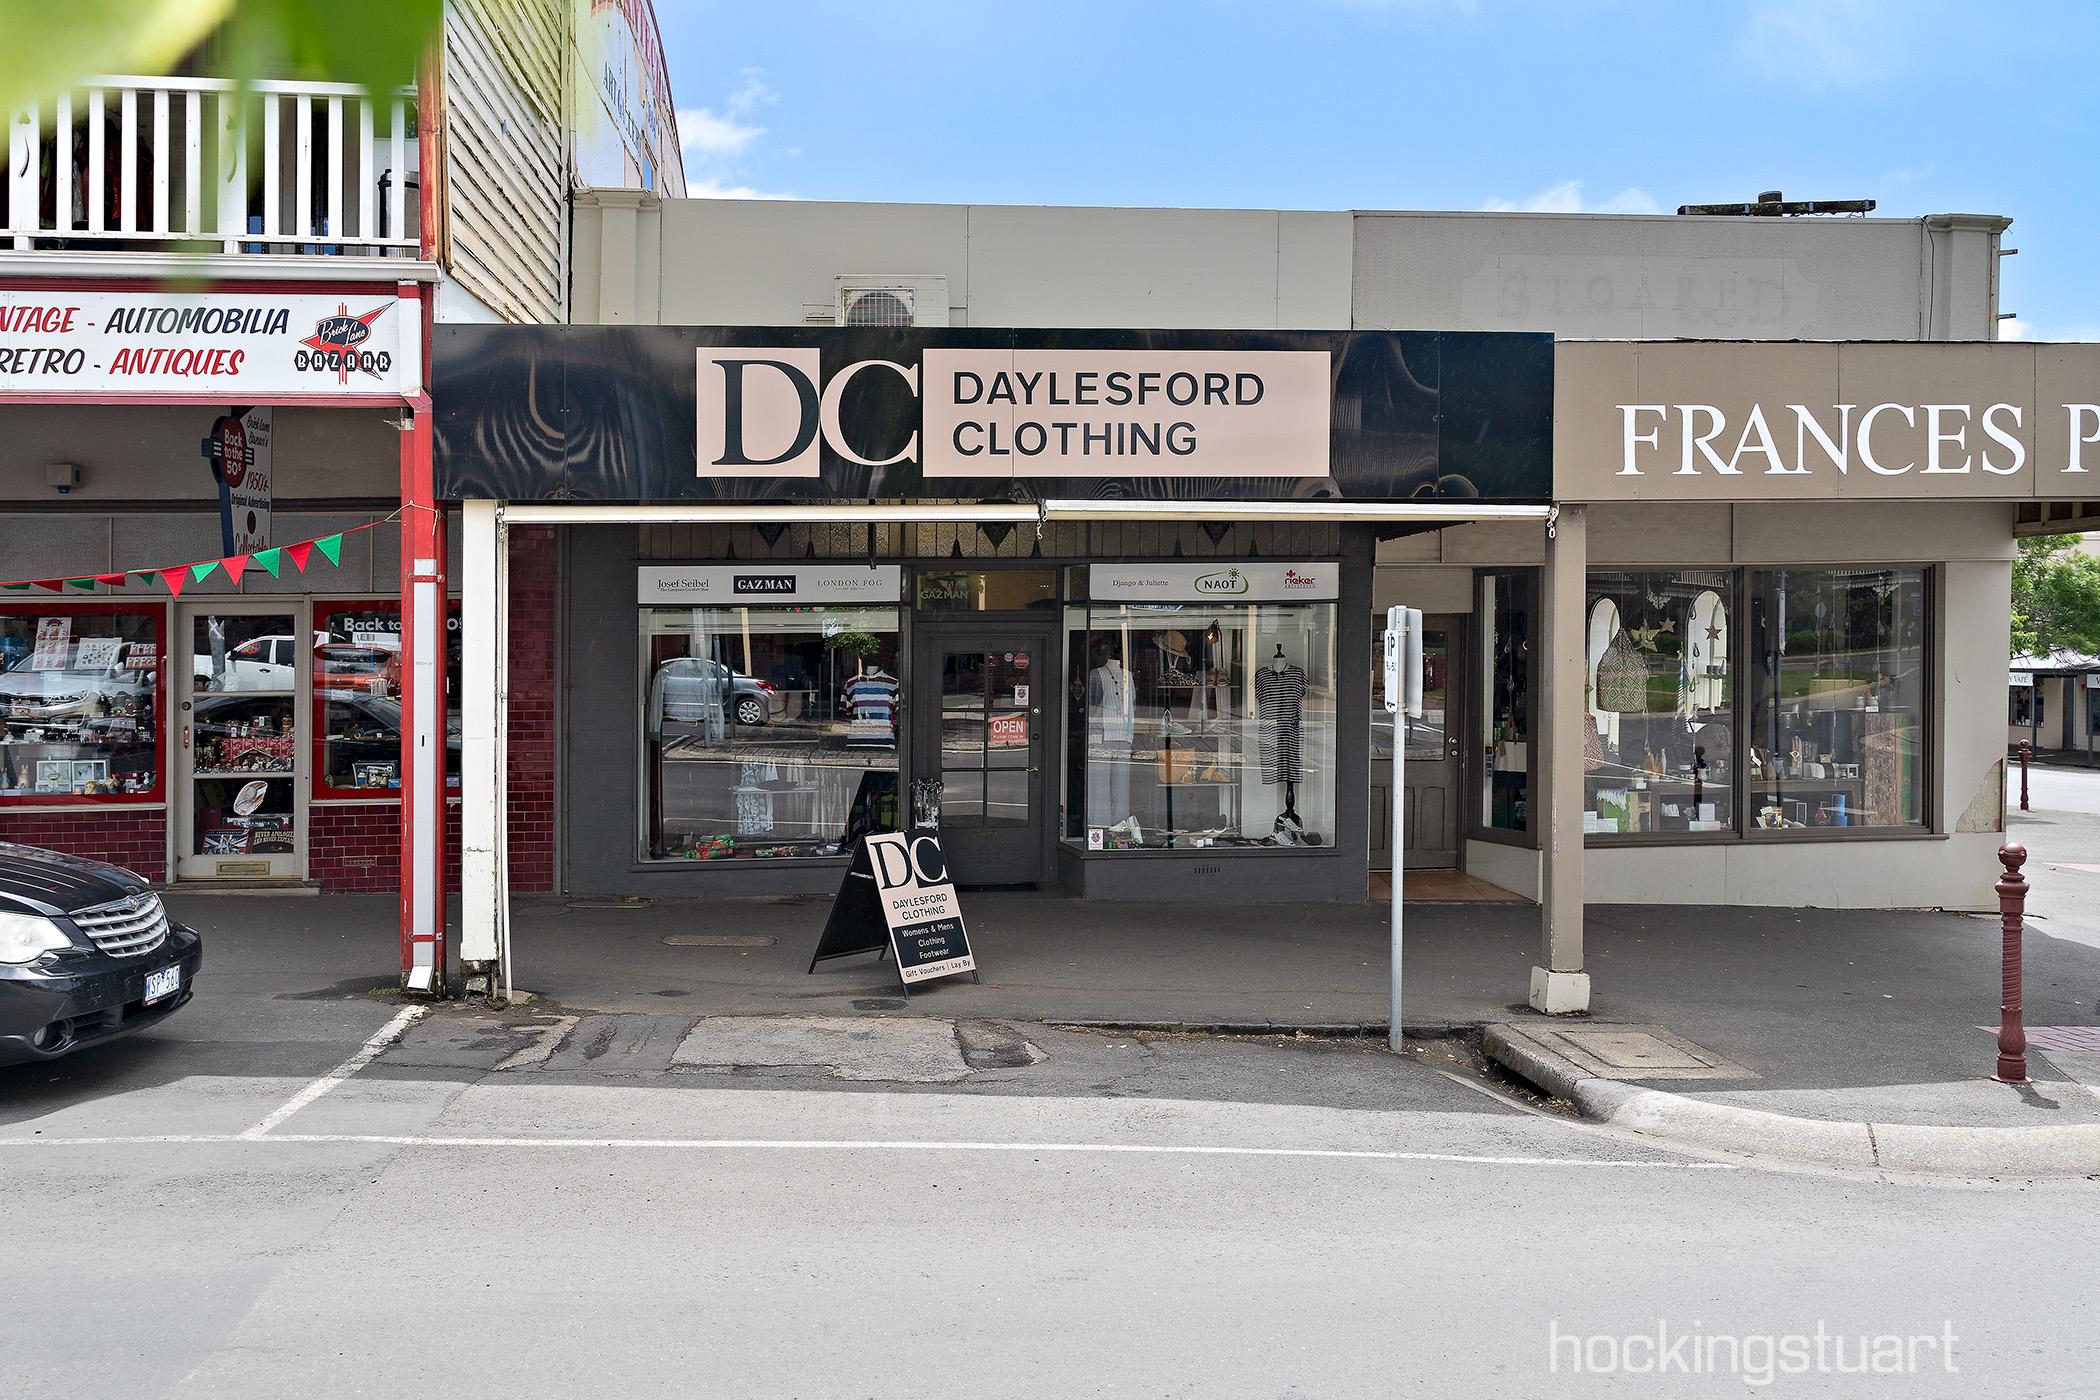 30, Vincent Street, DAYLESFORD, VIC 3460